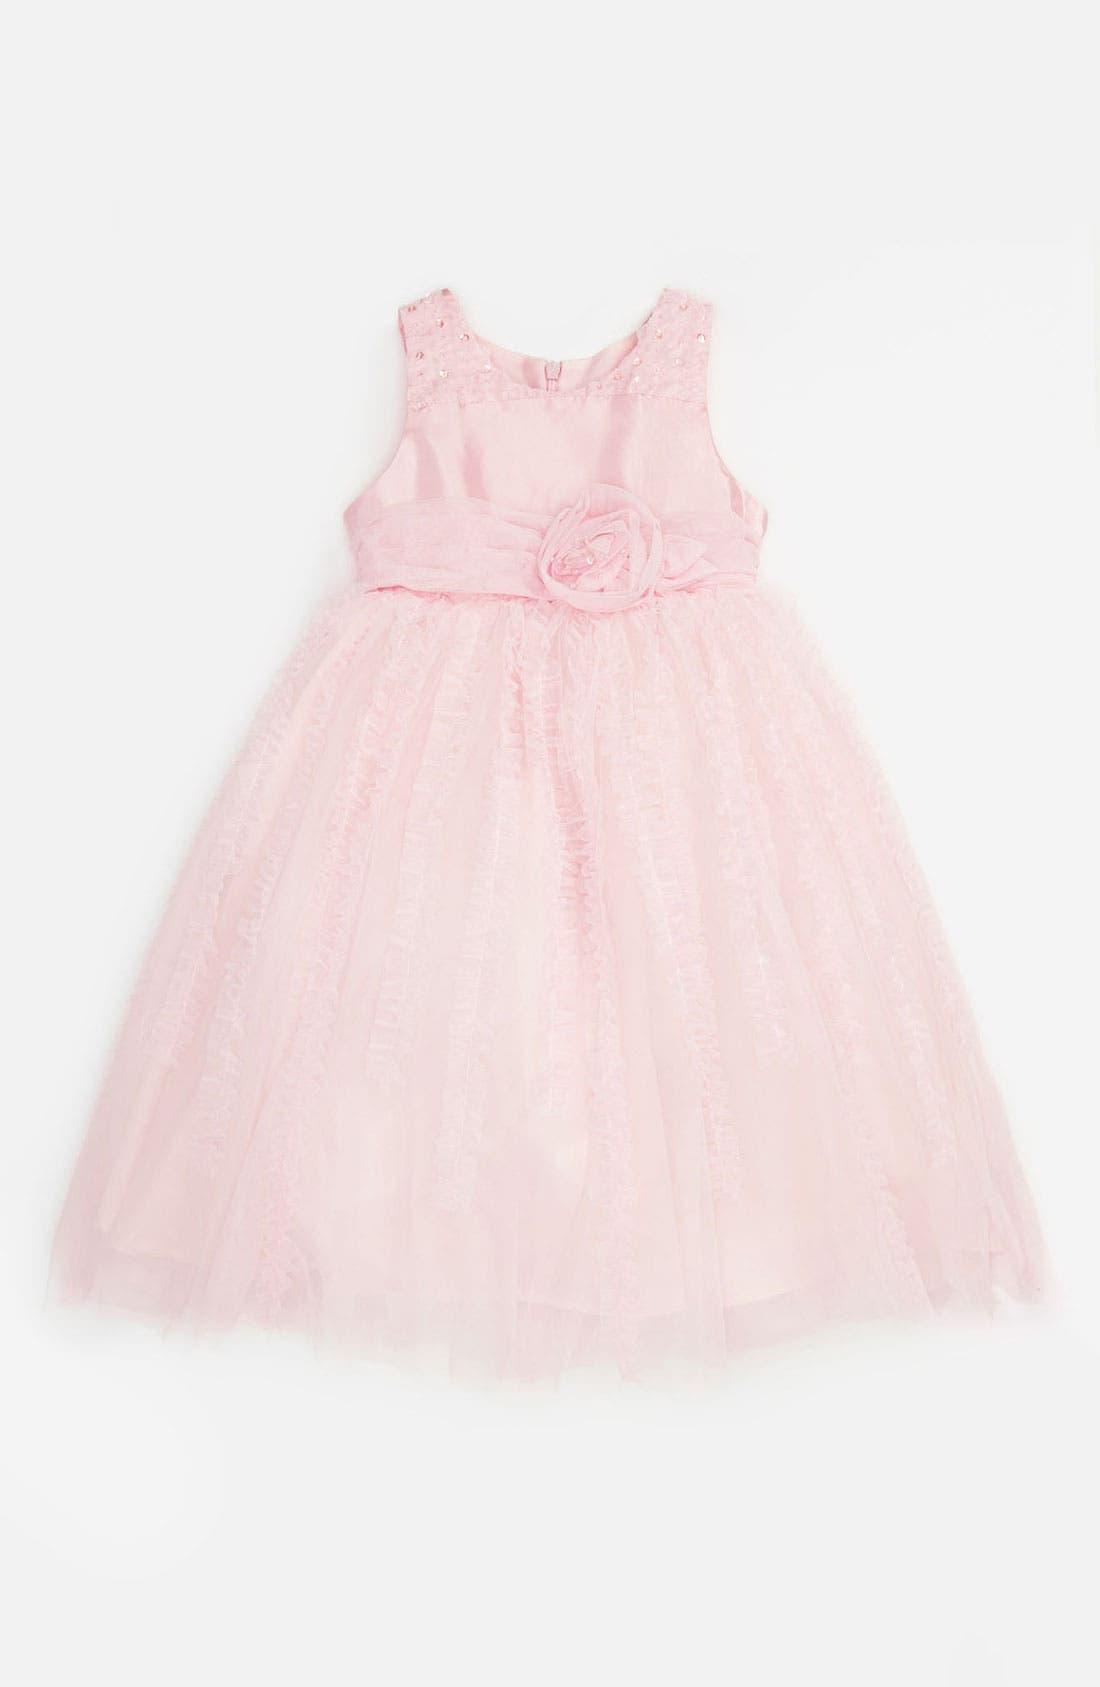 Main Image - Isobella & Chloe 'Fairy Floss' Dress (Toddler)